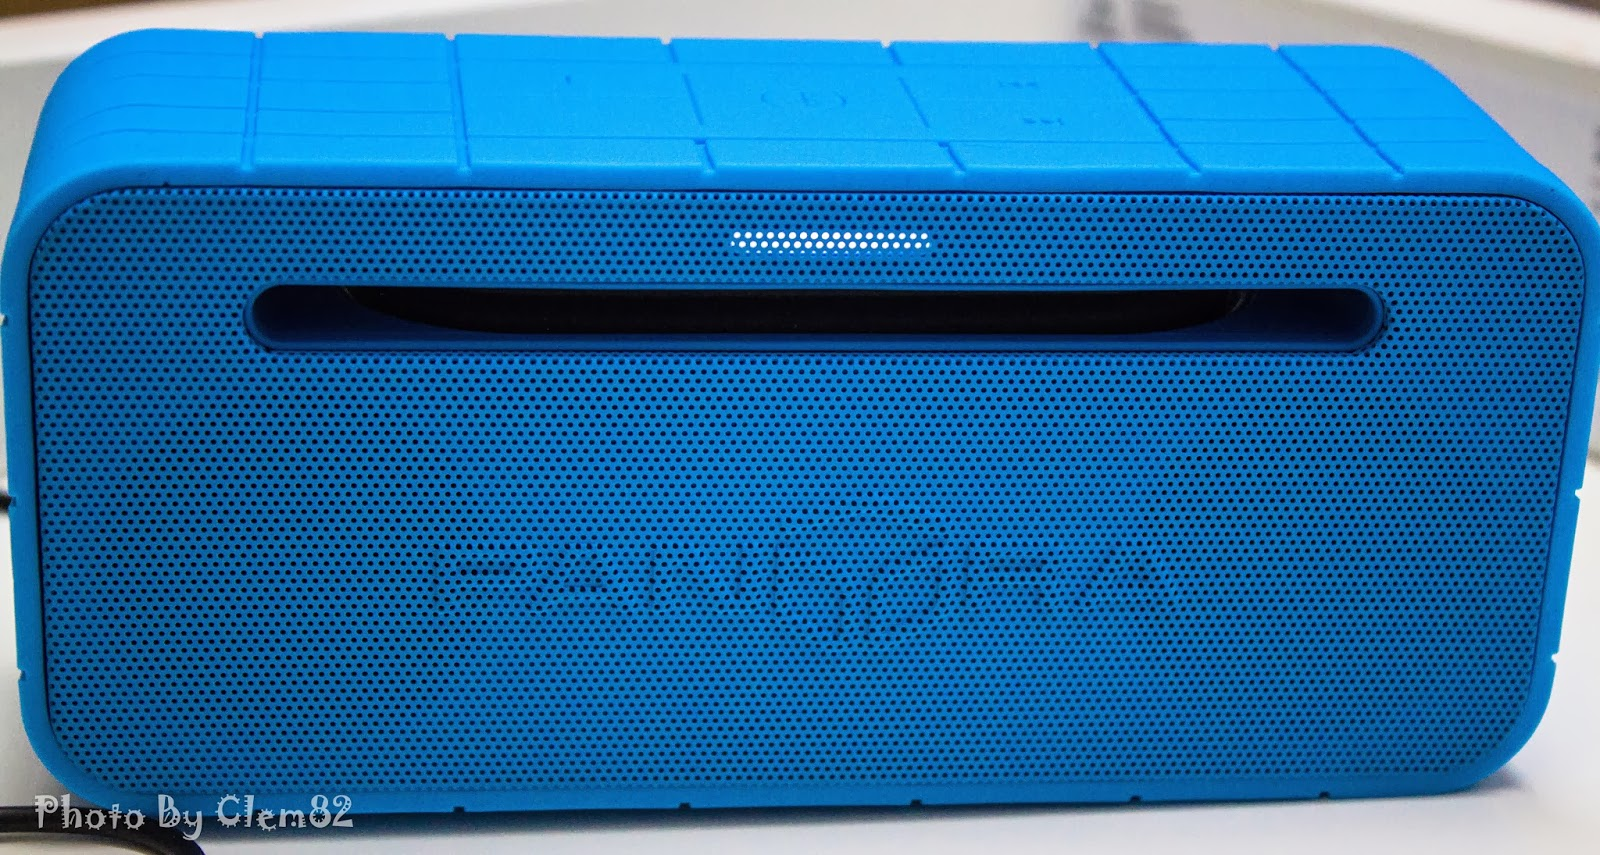 Opening Pandora's Box: SonicGear Pandora Wireless Bluetooth Media Player Series 16